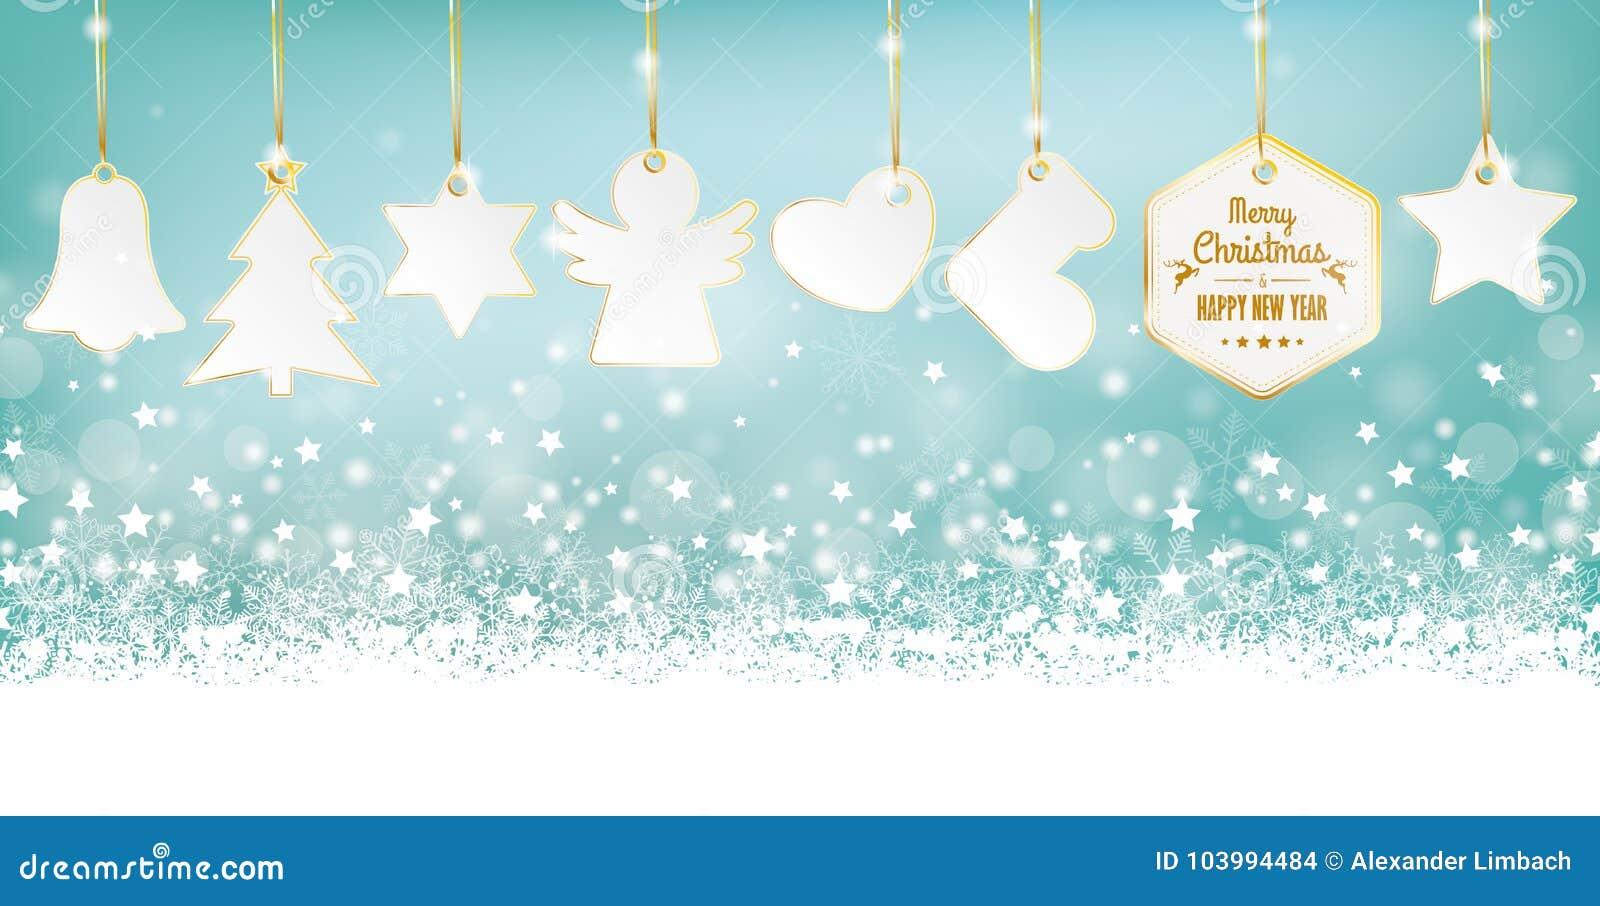 Christmas Header.Cyan Merry Christmas Card Header Snowflakes Golden Stickers